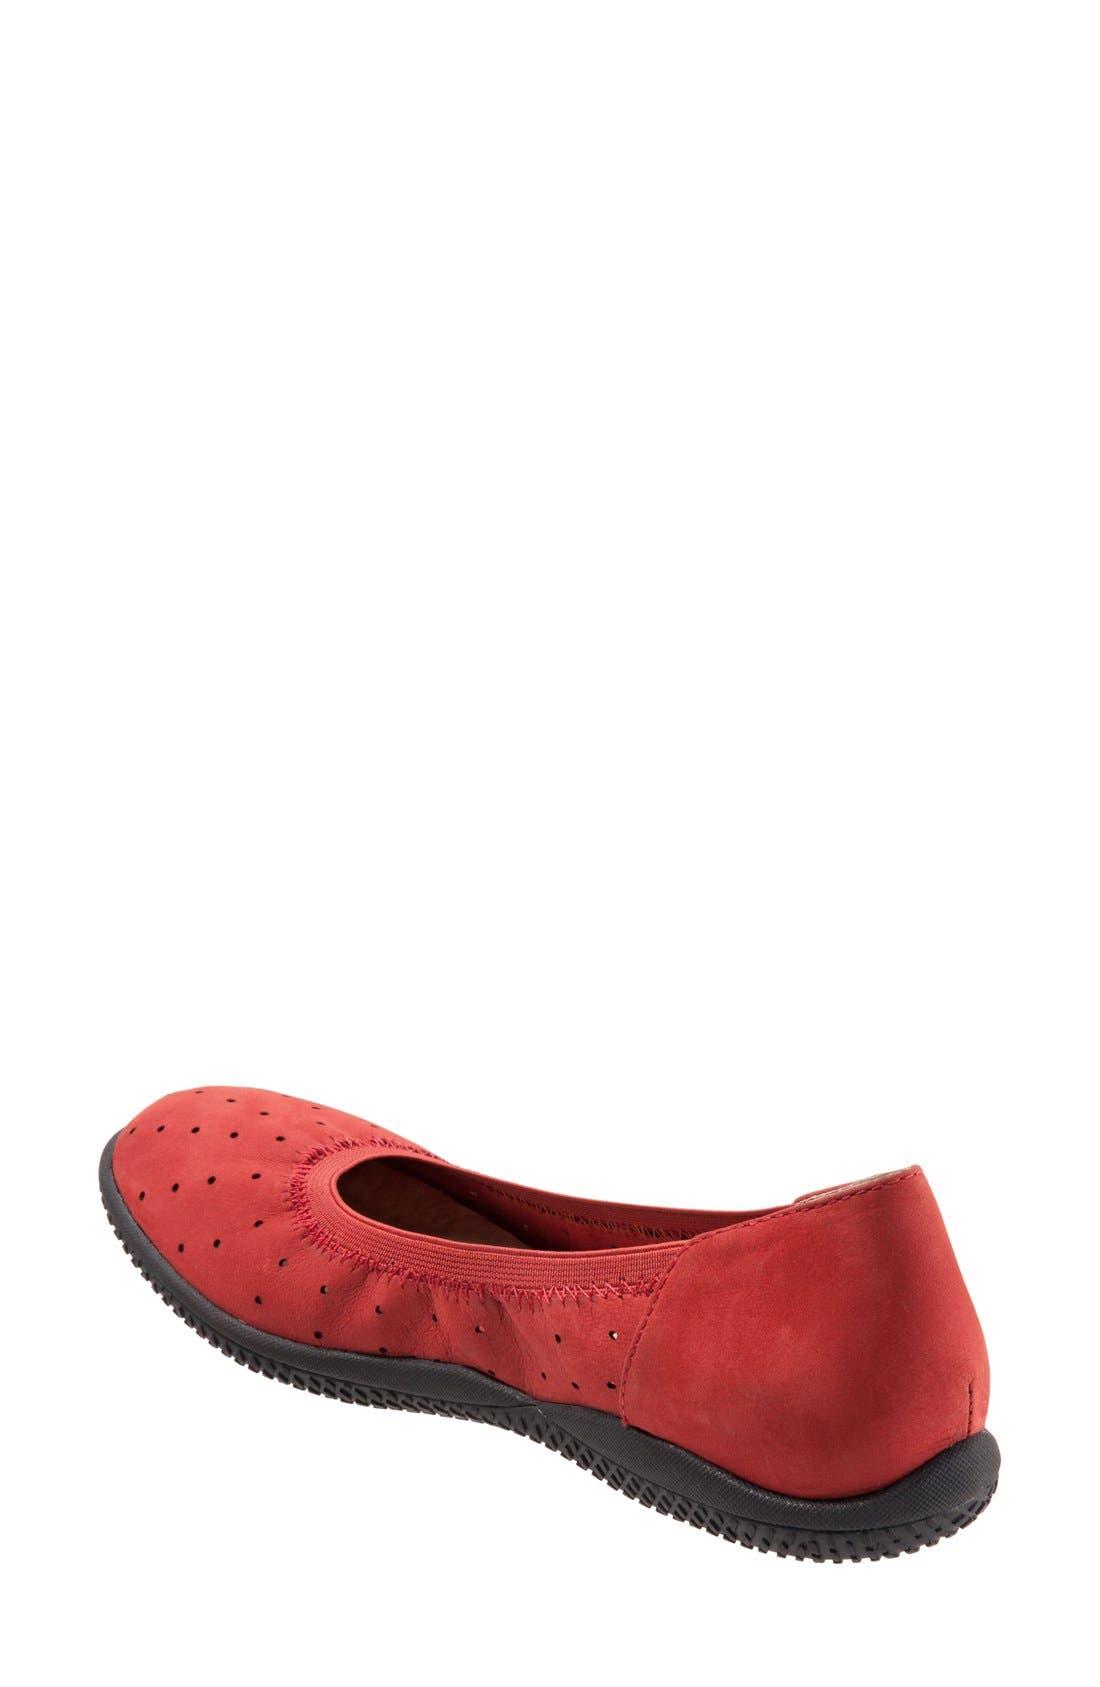 Alternate Image 2  - SoftWalk® 'Hampshire' Dot Perforated Ballet Flat (Women)